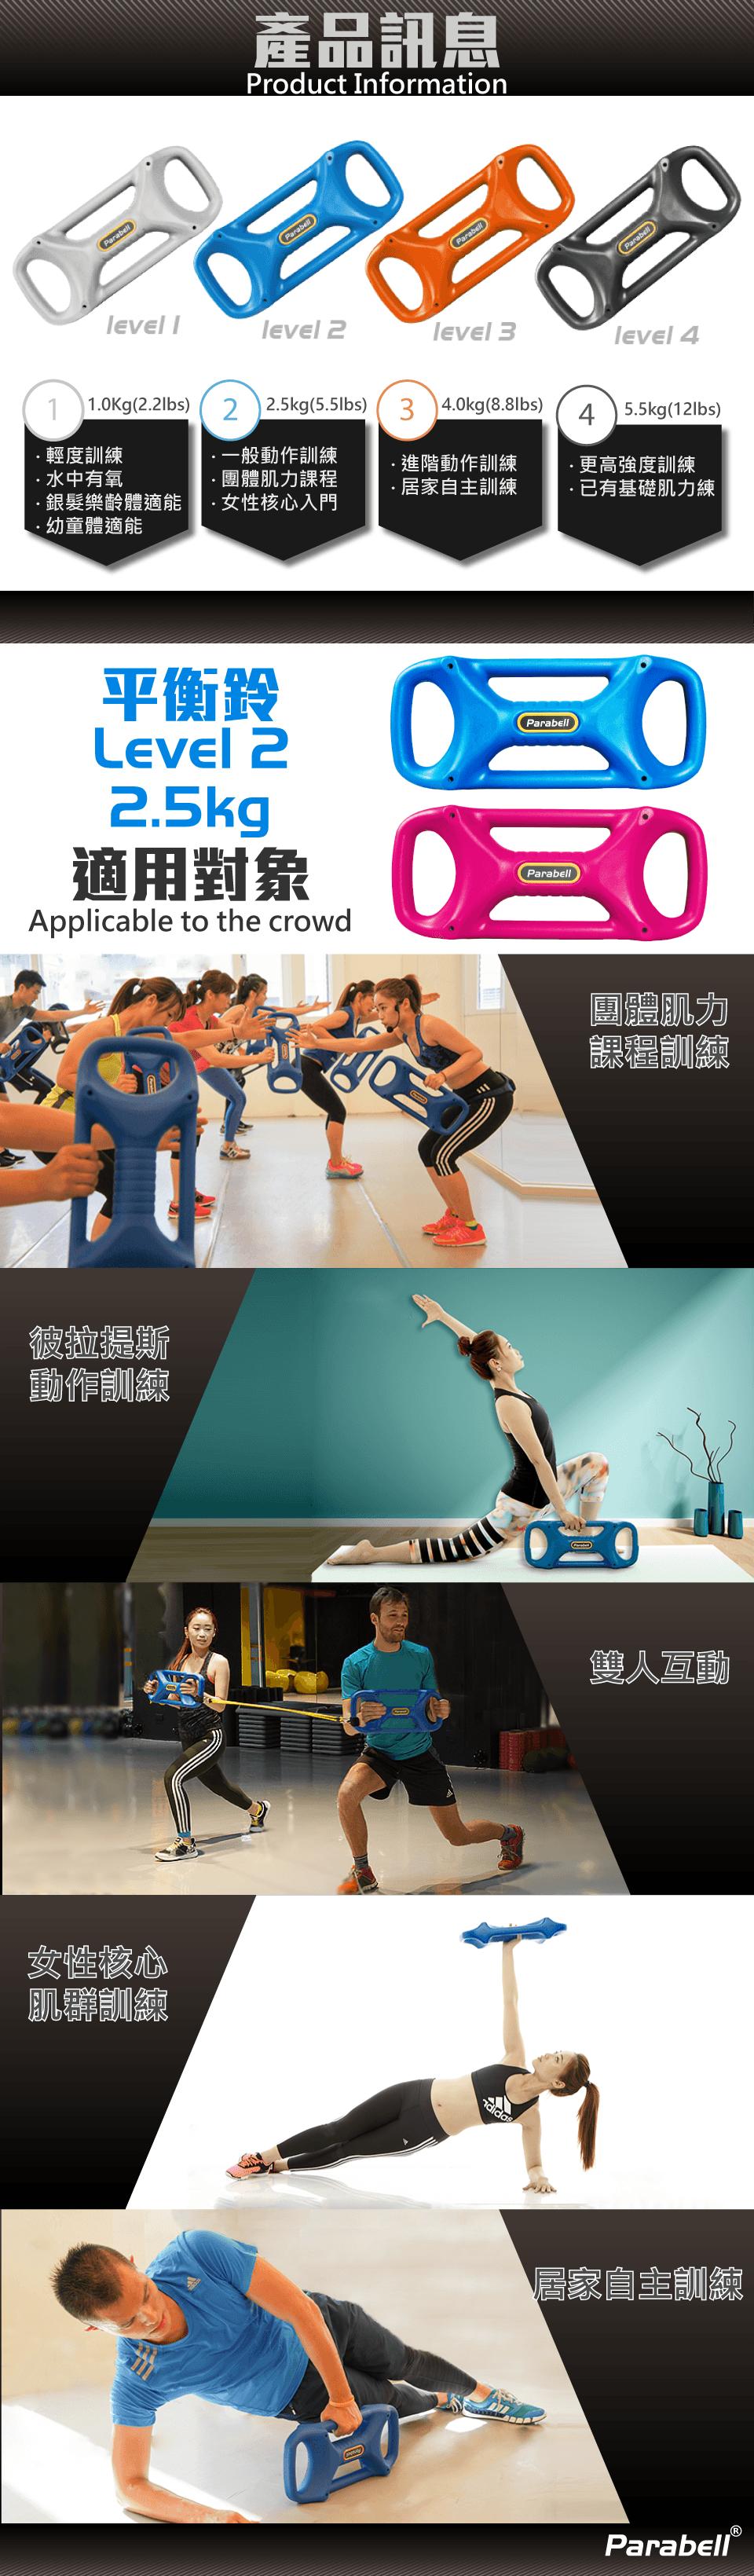 【XOANON洛恩耐運動健身】Parabell 平衡鈴 level 2 藍 / 2.5KG 1